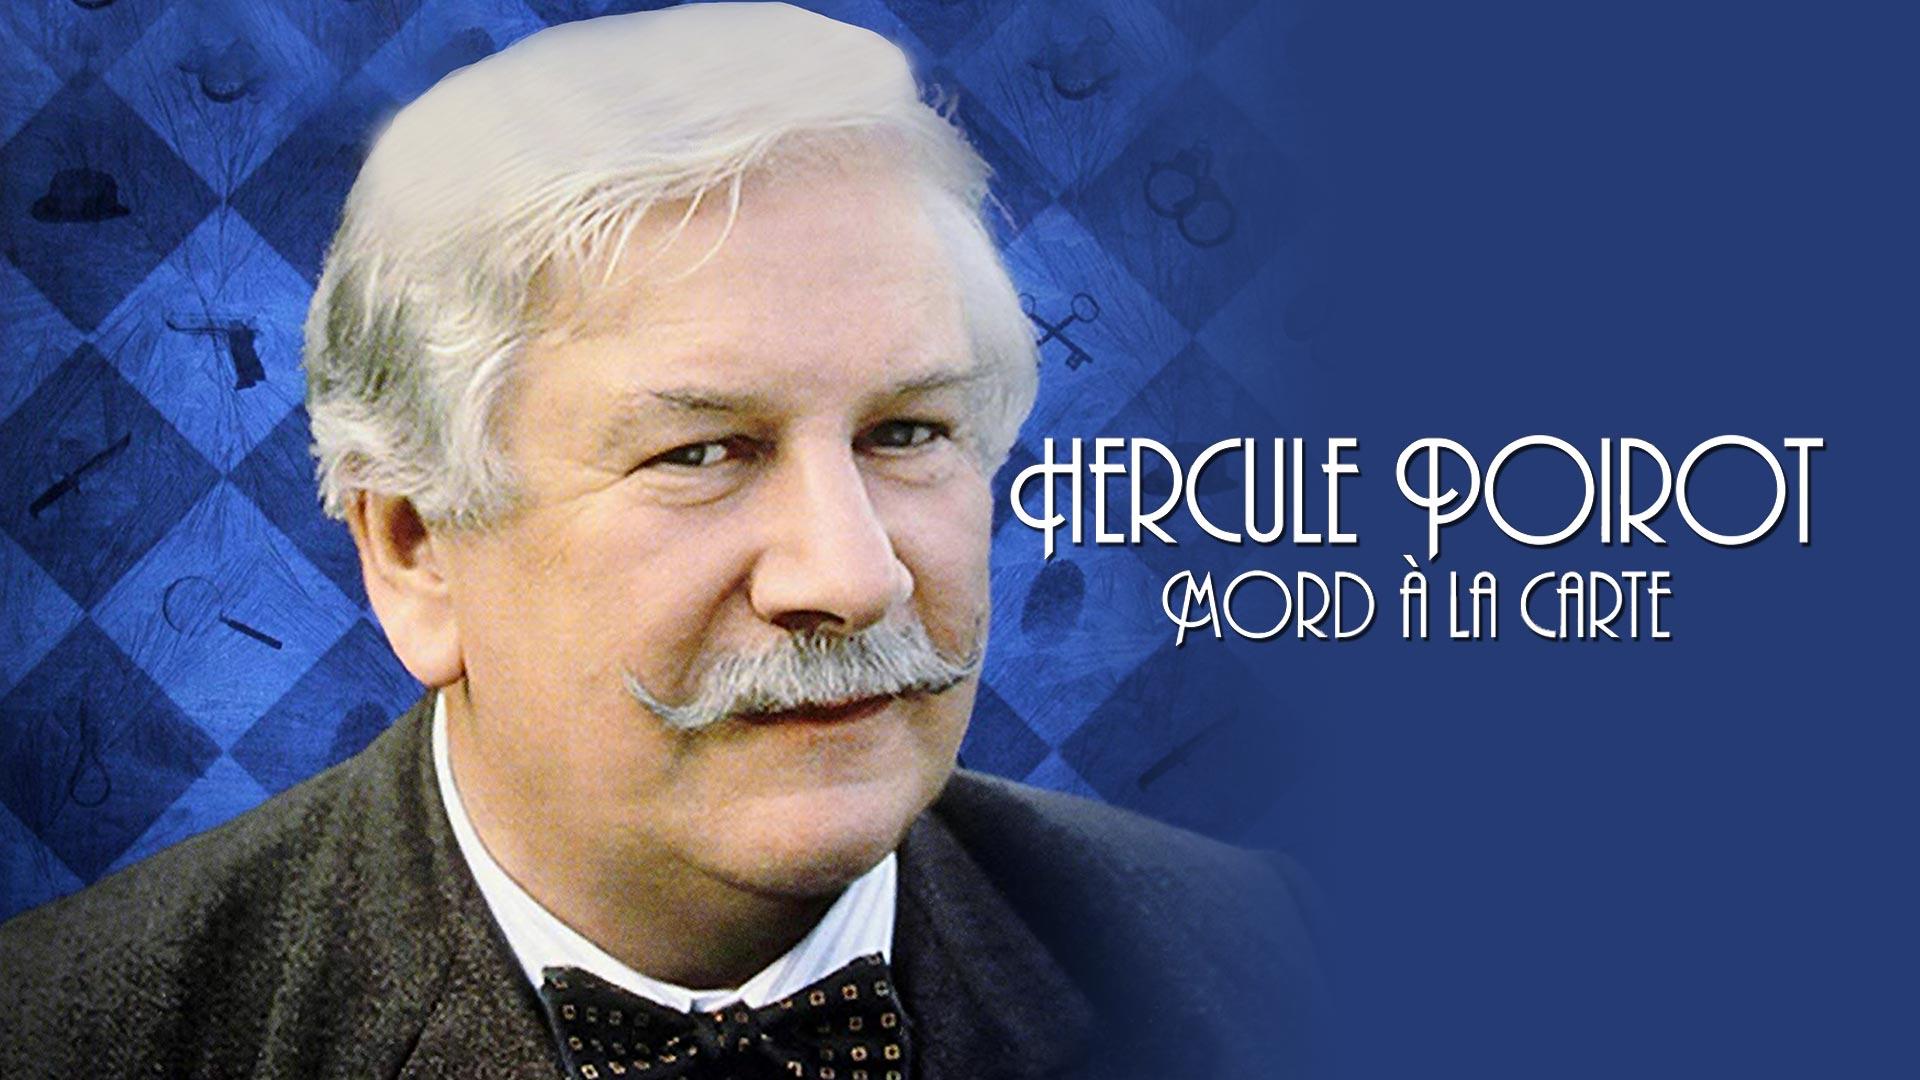 Hercule Poirot: Mord à la Carte